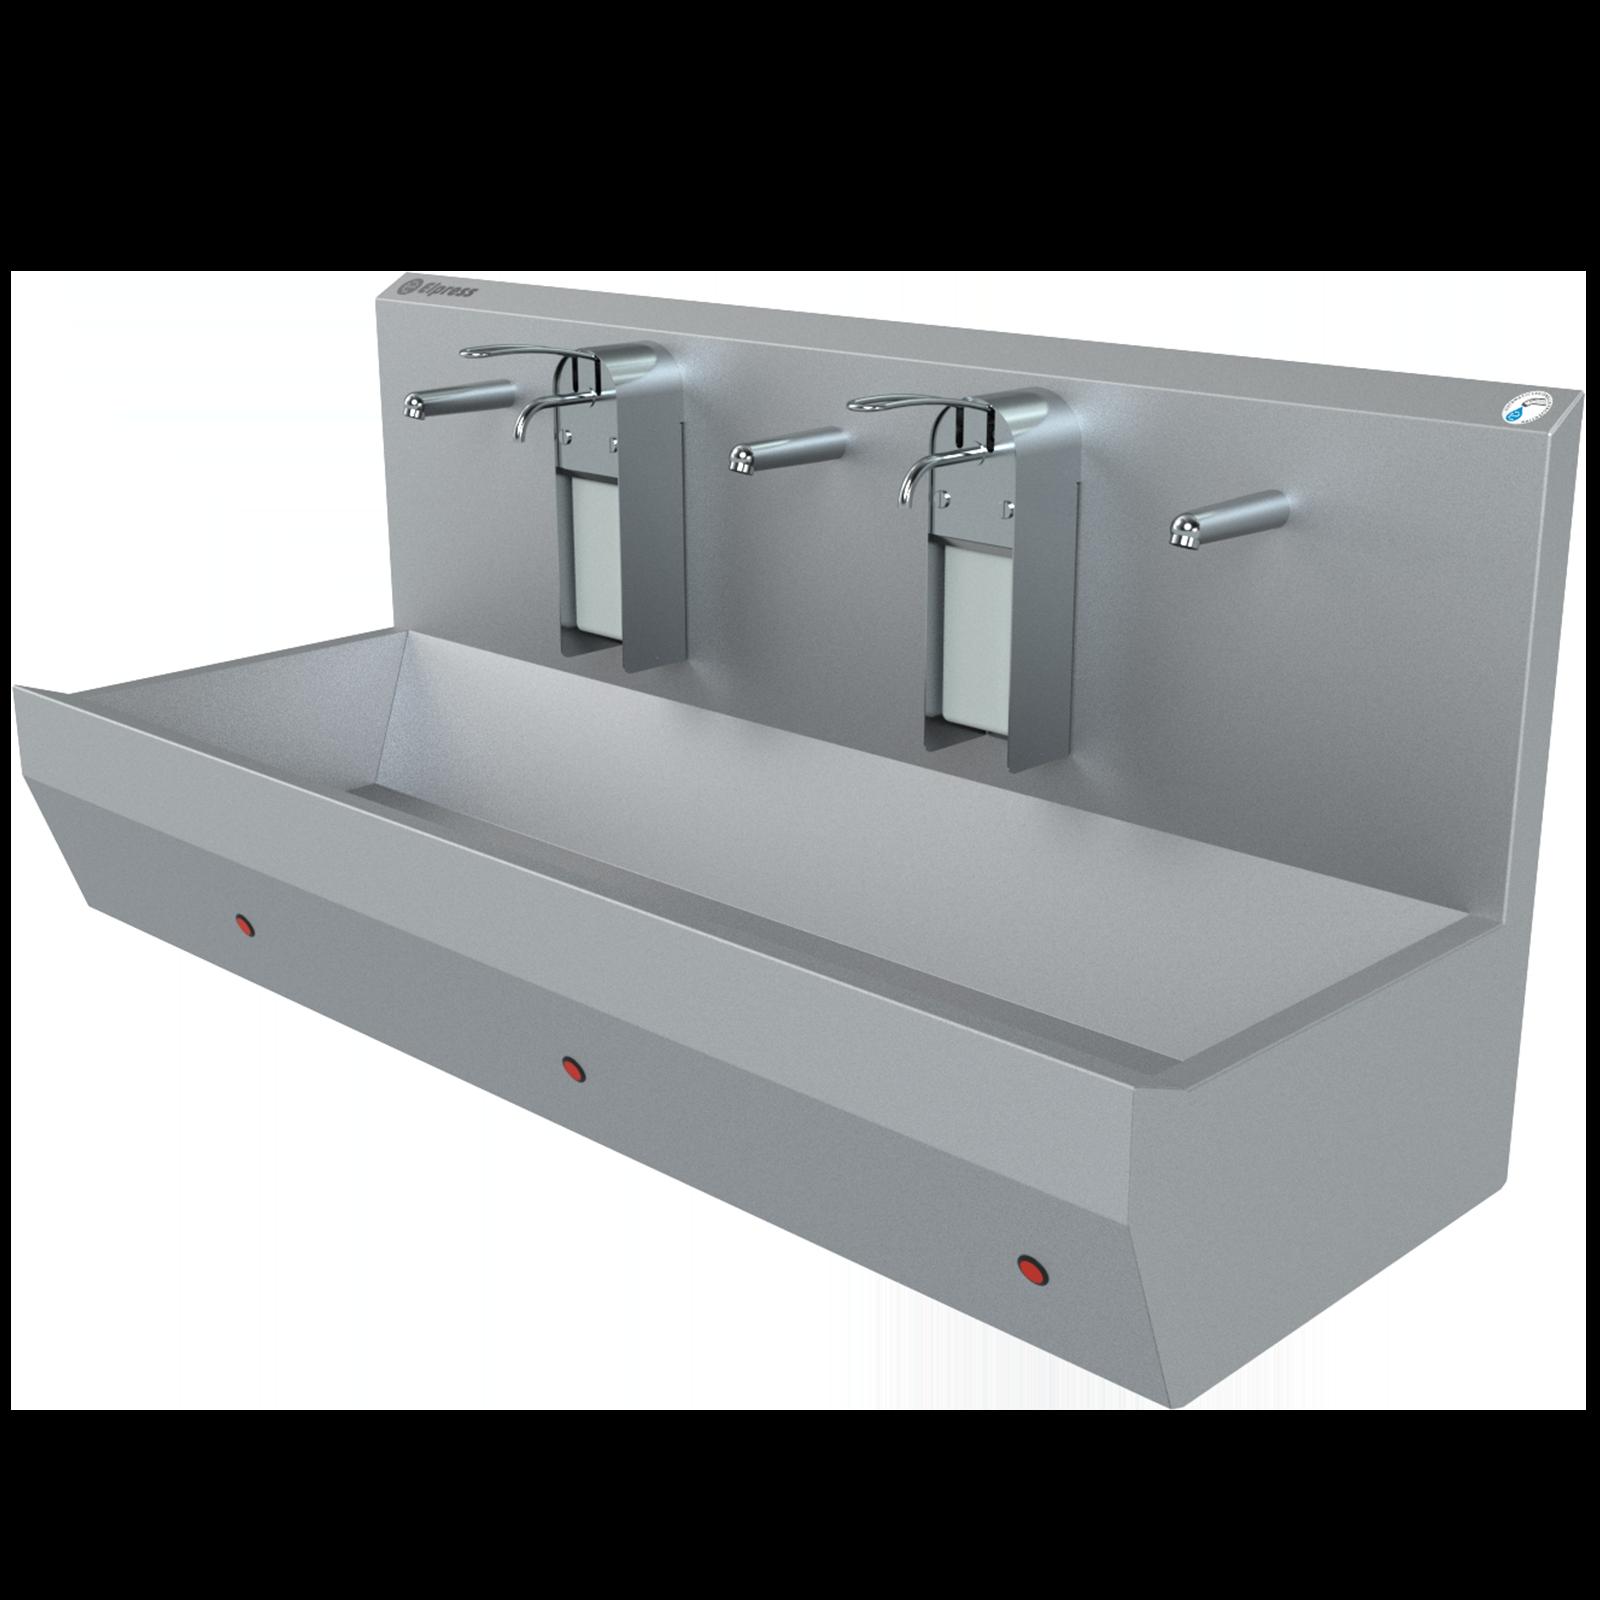 Wash basin - EWG-3S